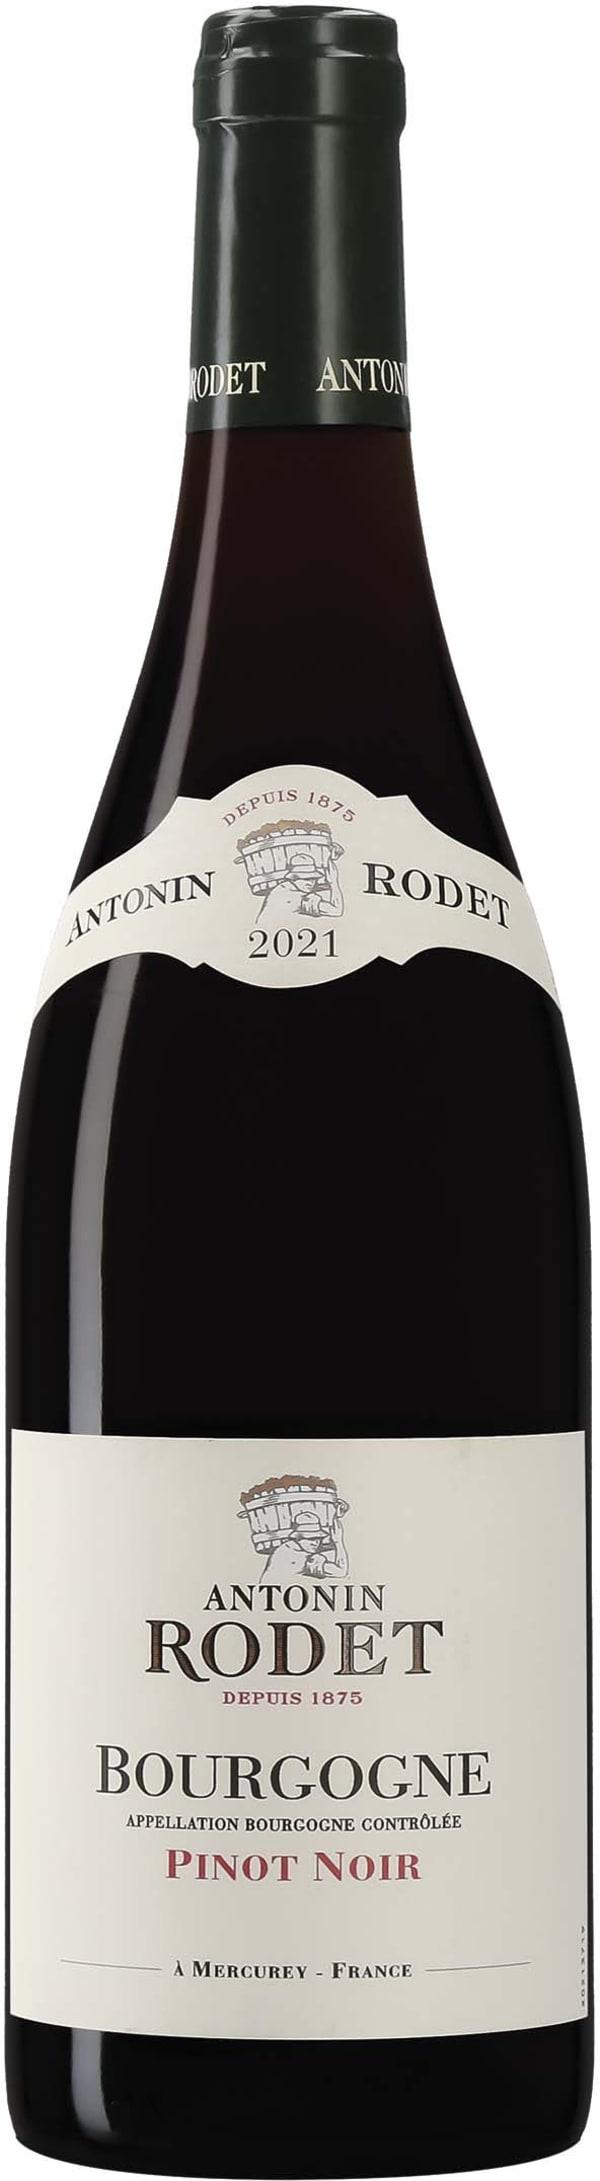 Antonin Rodet Pinot Noir 2015